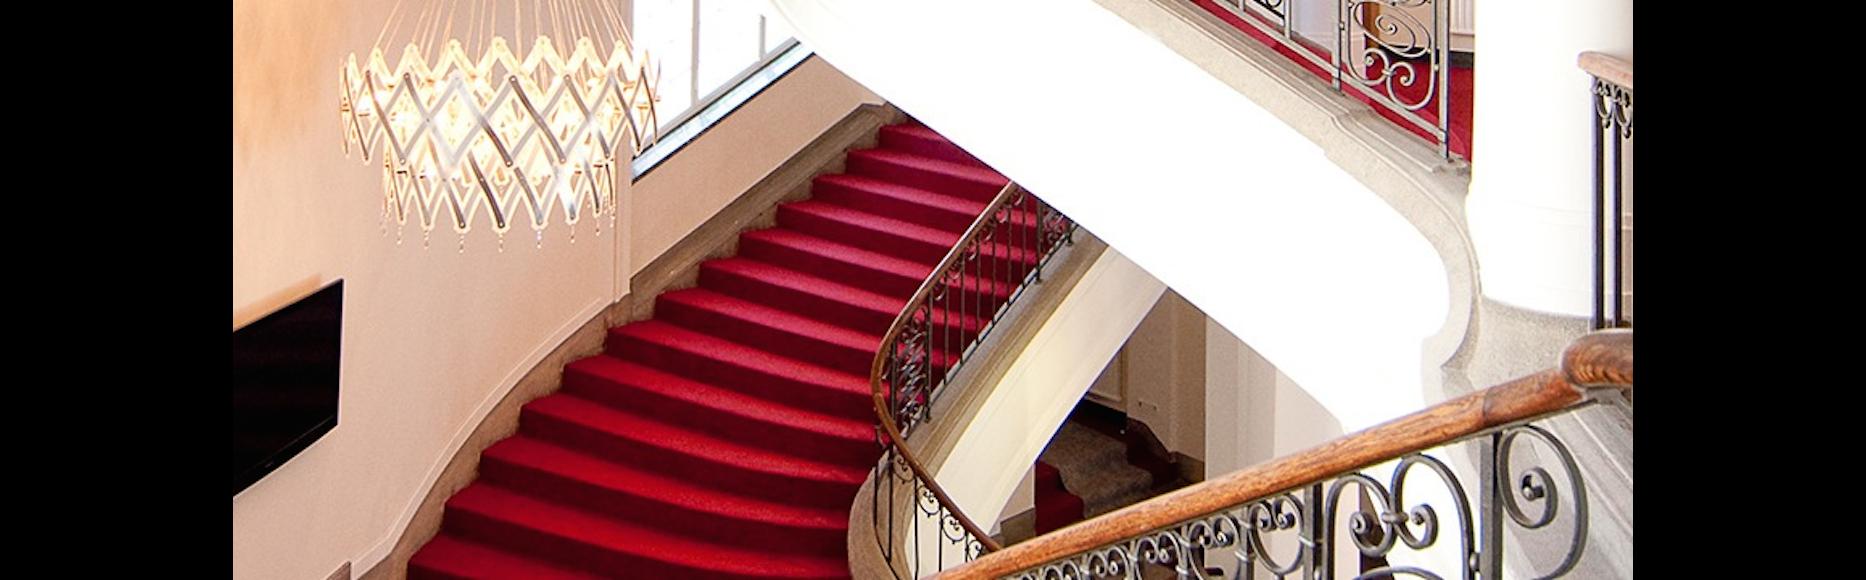 Treppenaufgang2 1400x580_neu